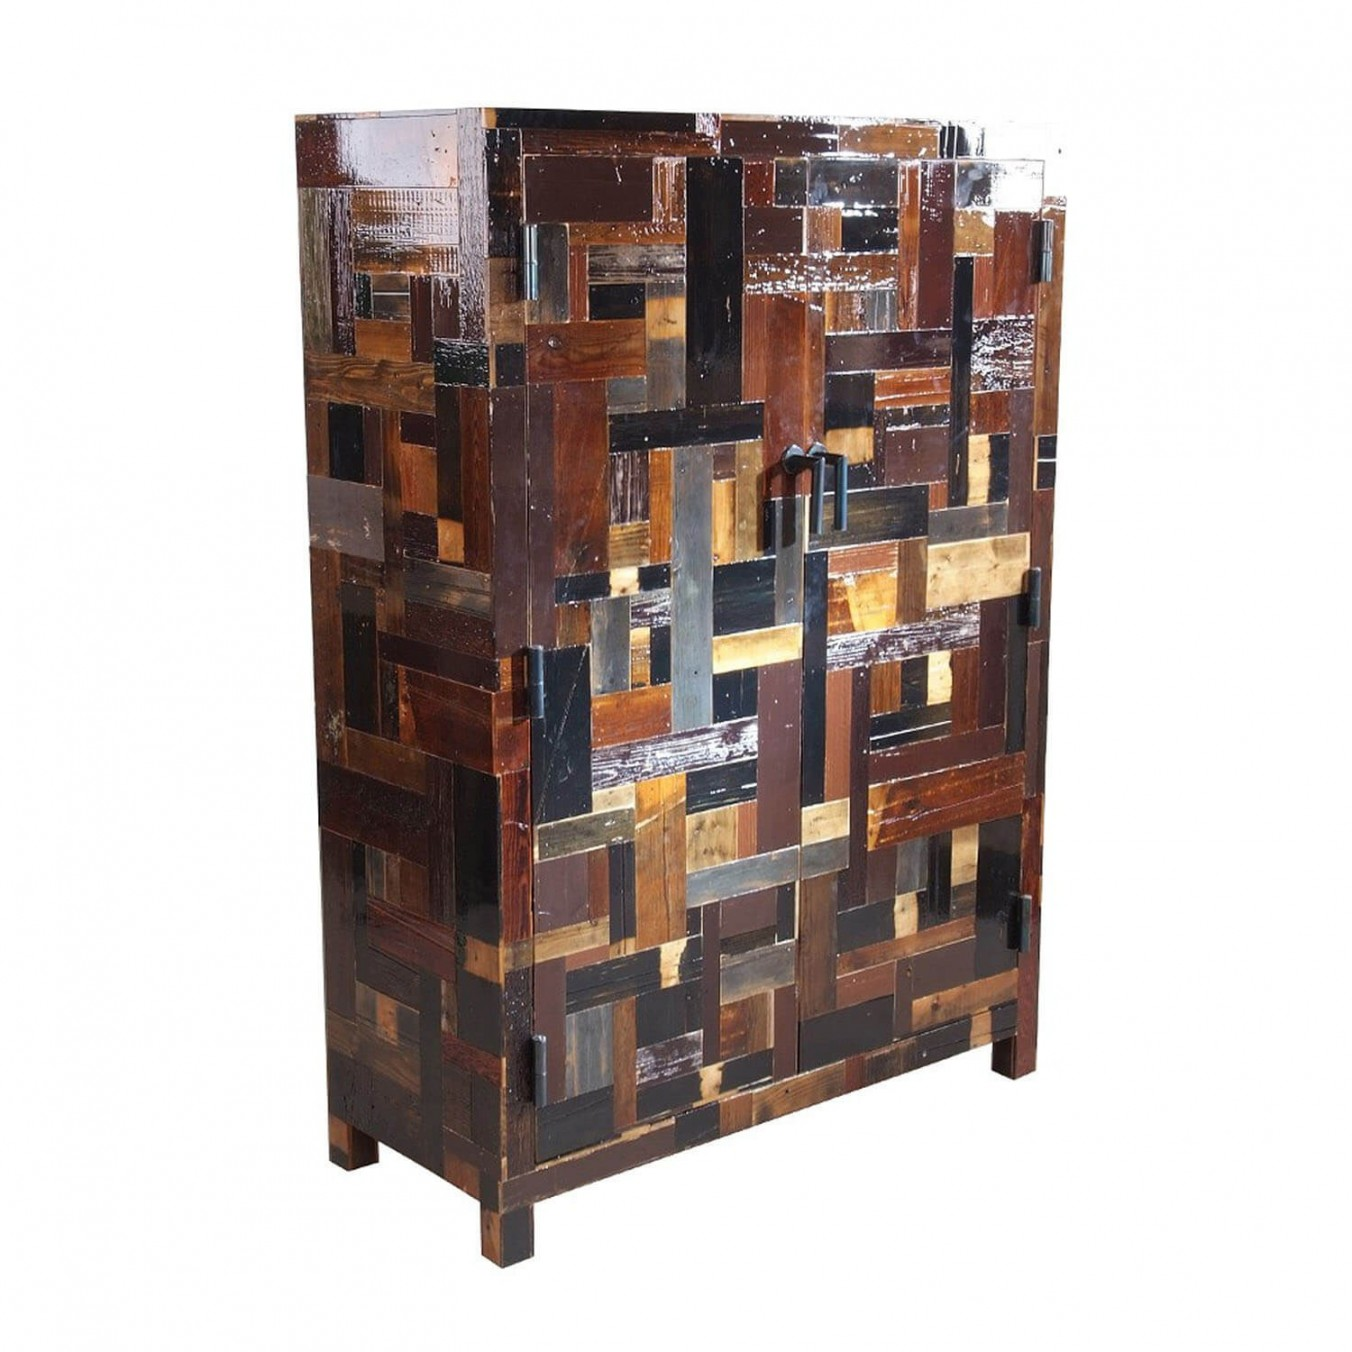 Dark Waste Cabinet in Scrapwood